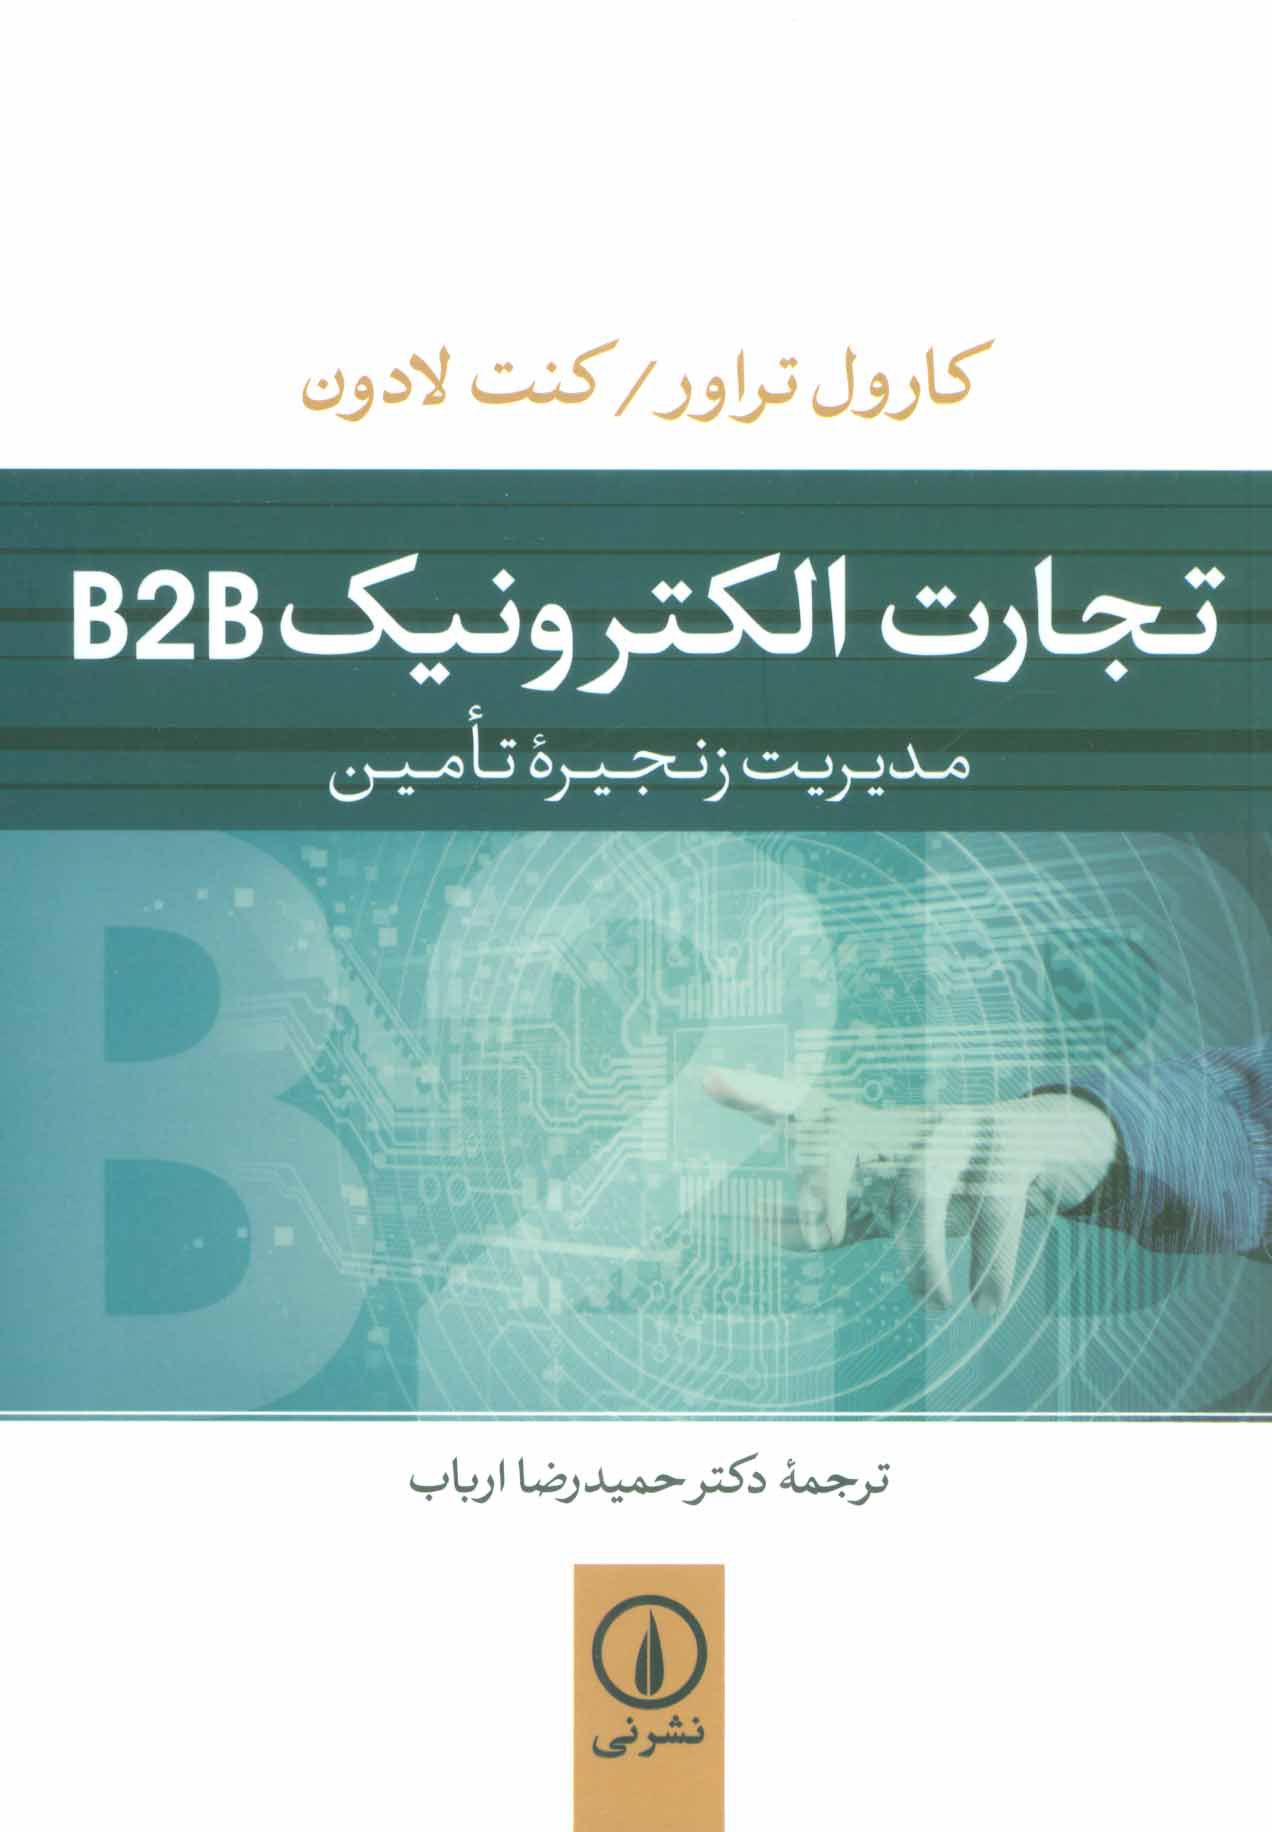 کتاب تجارت الکترونیک B2B